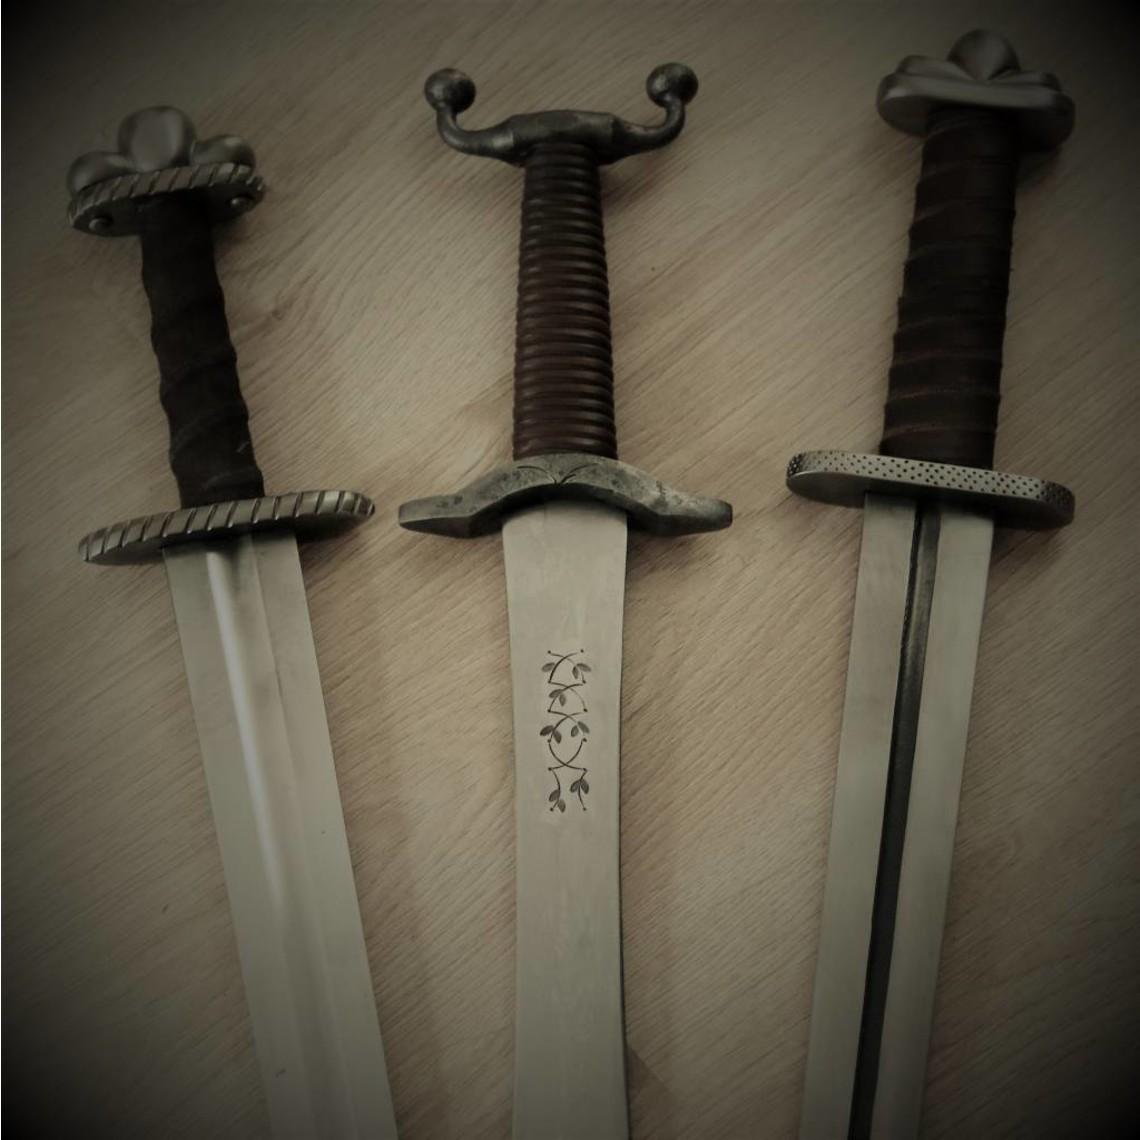 Blunting service daggers (+3 weeks)